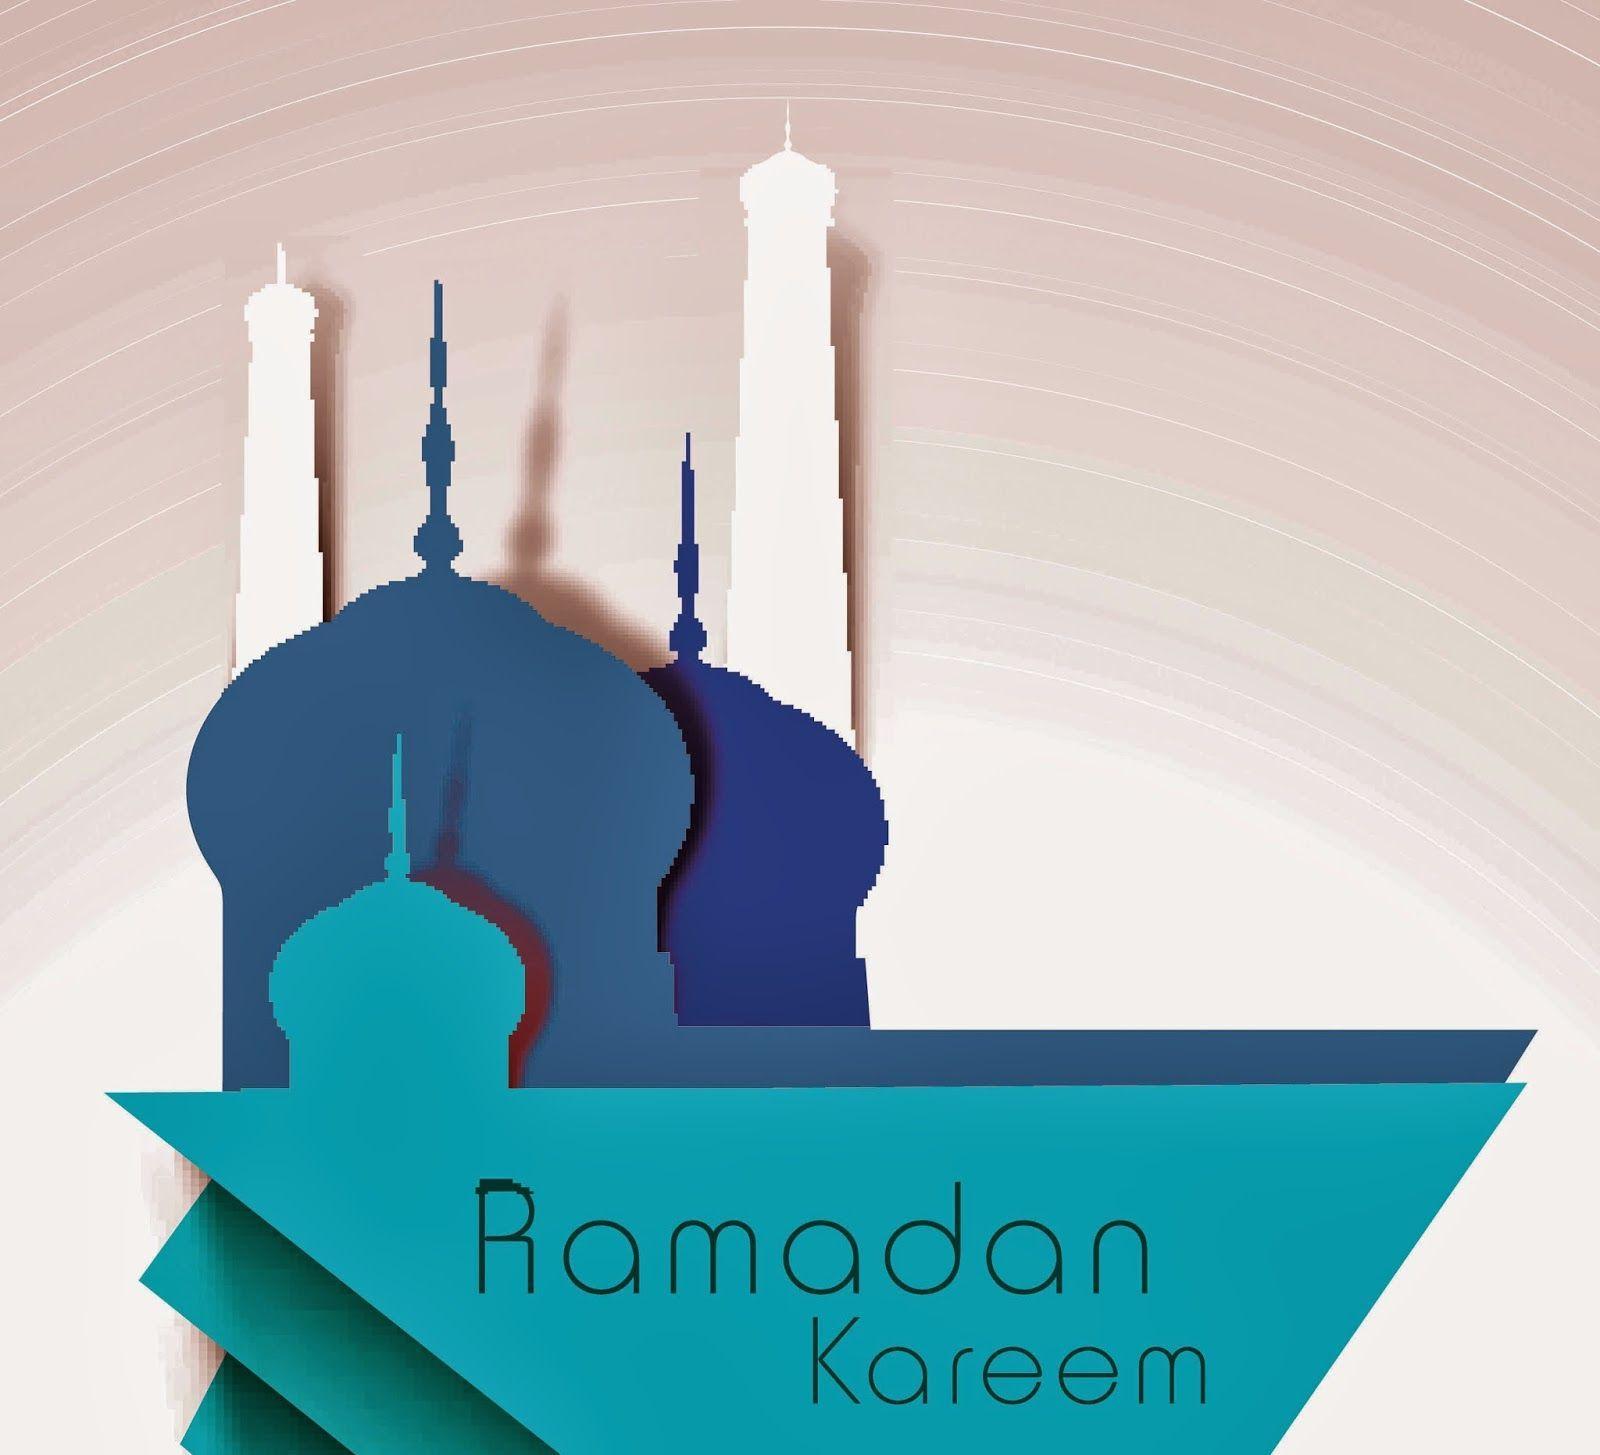 ramadan mubarak in arabic wallpapers 2015 wallpaper cave